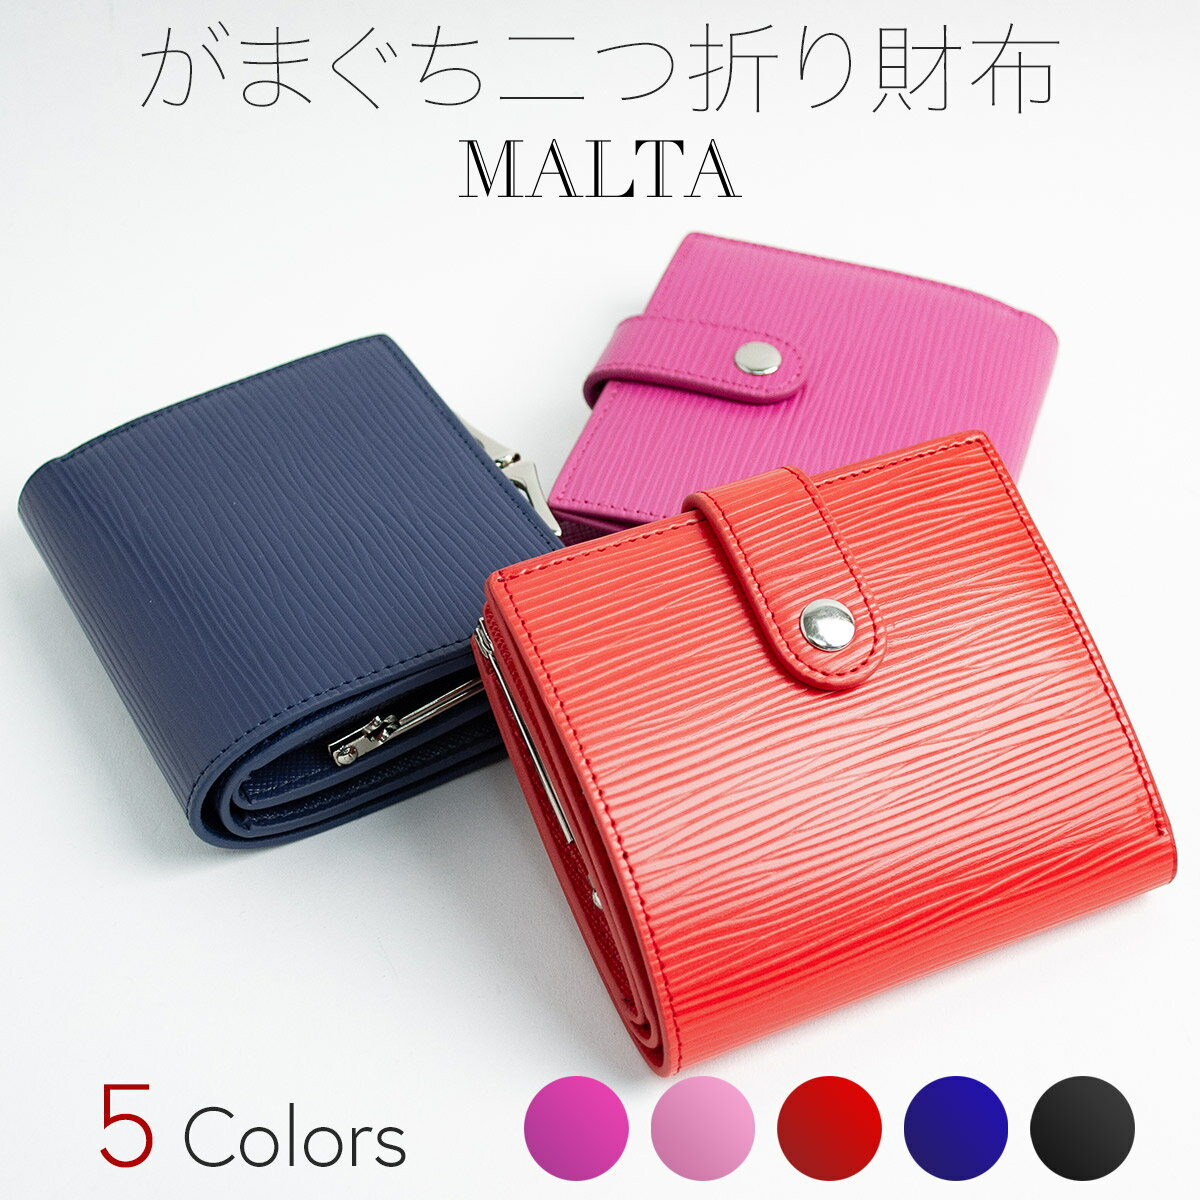 【SALE】二つ折り財布 がま口 牛革 本革 レザー がまぐち小銭入れ カード入れ レディース MALTA ブランド ミニ財布 コンパクト 送料無料